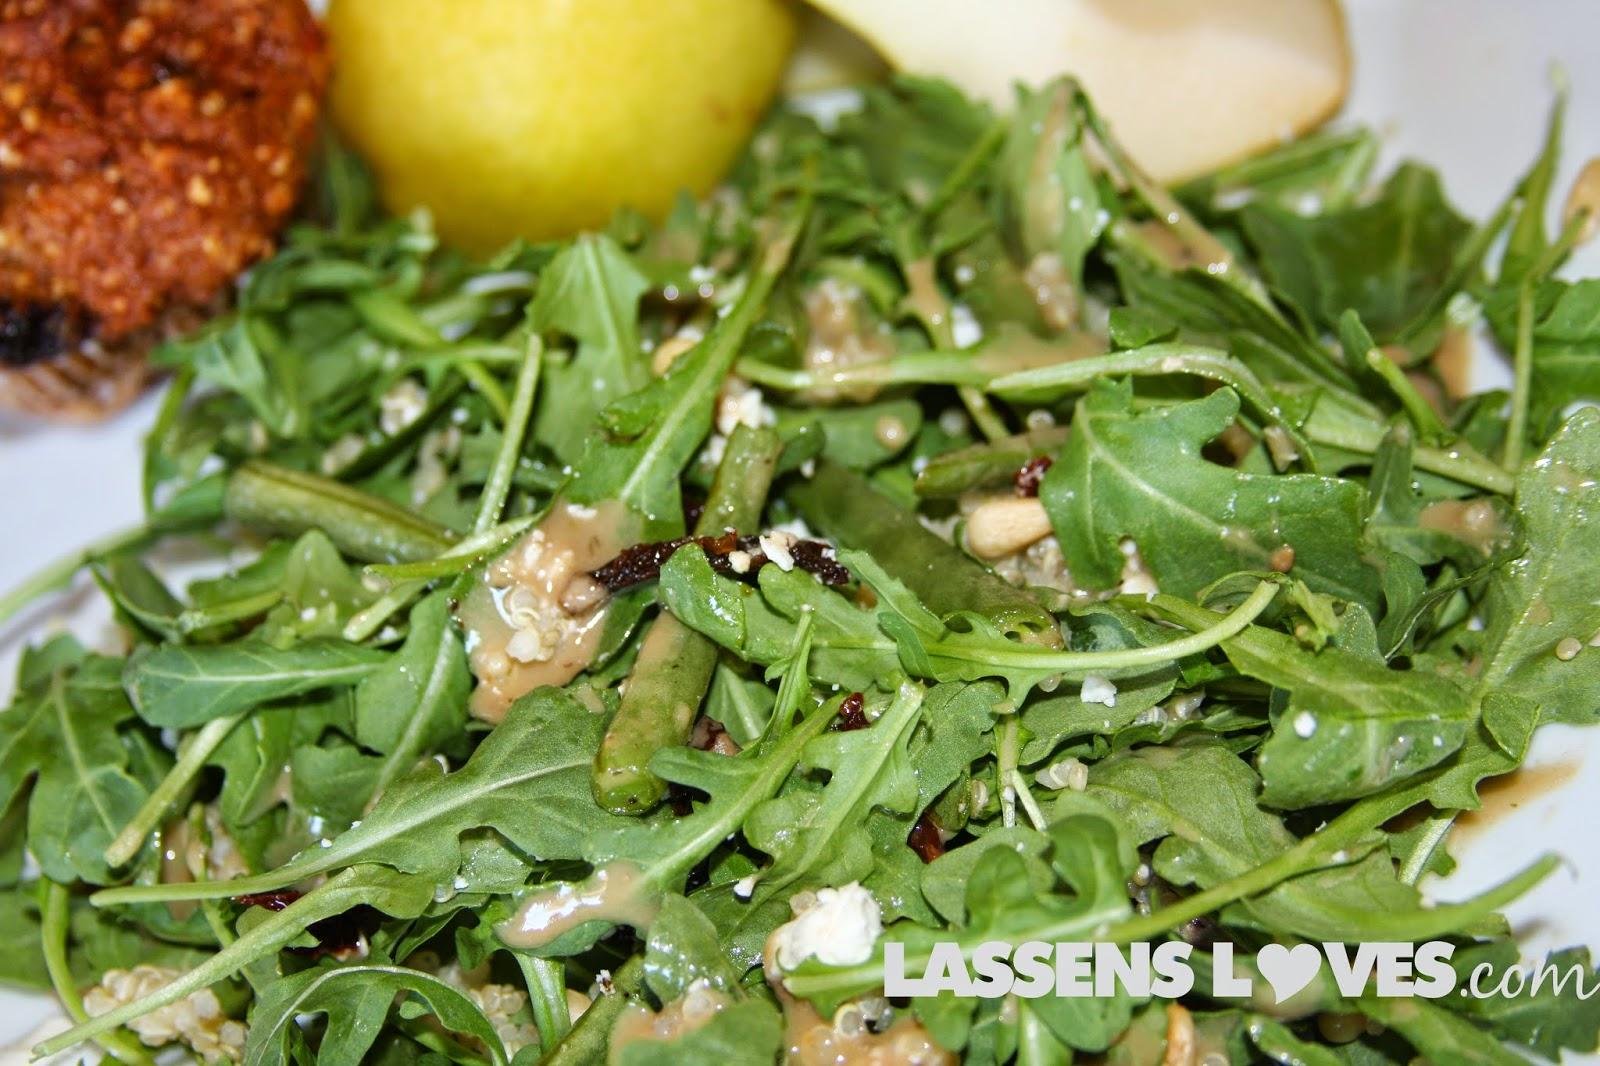 Drews+Dressing, Lemon+Goddess, arugula+salad, asparagus+salad, quinoa+salad